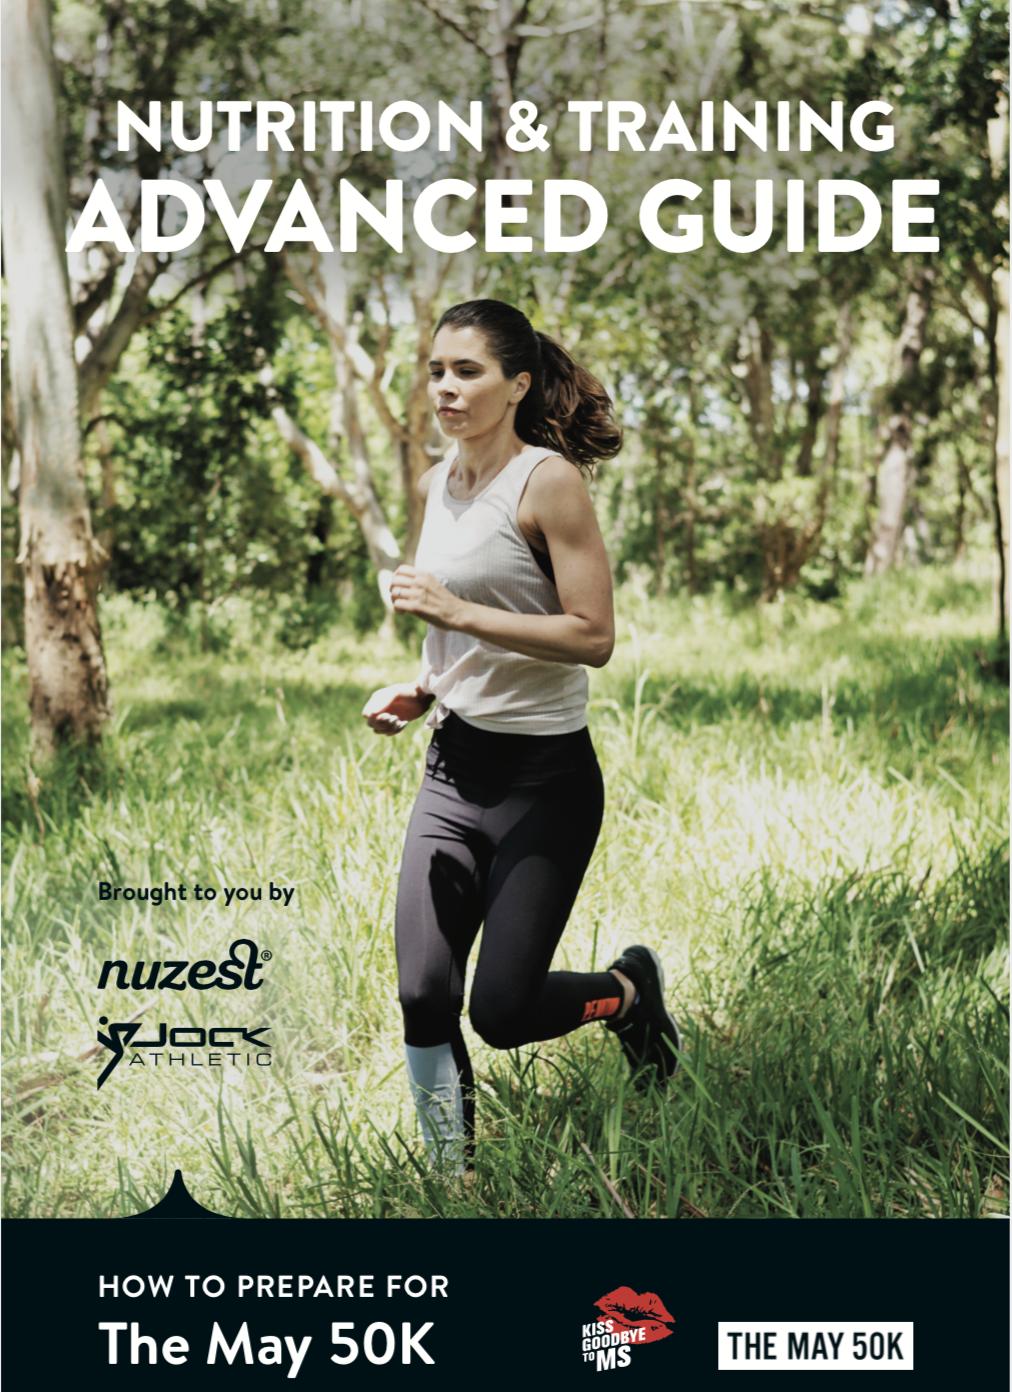 Nuzest's Nutrition & Training Guide – Advanced